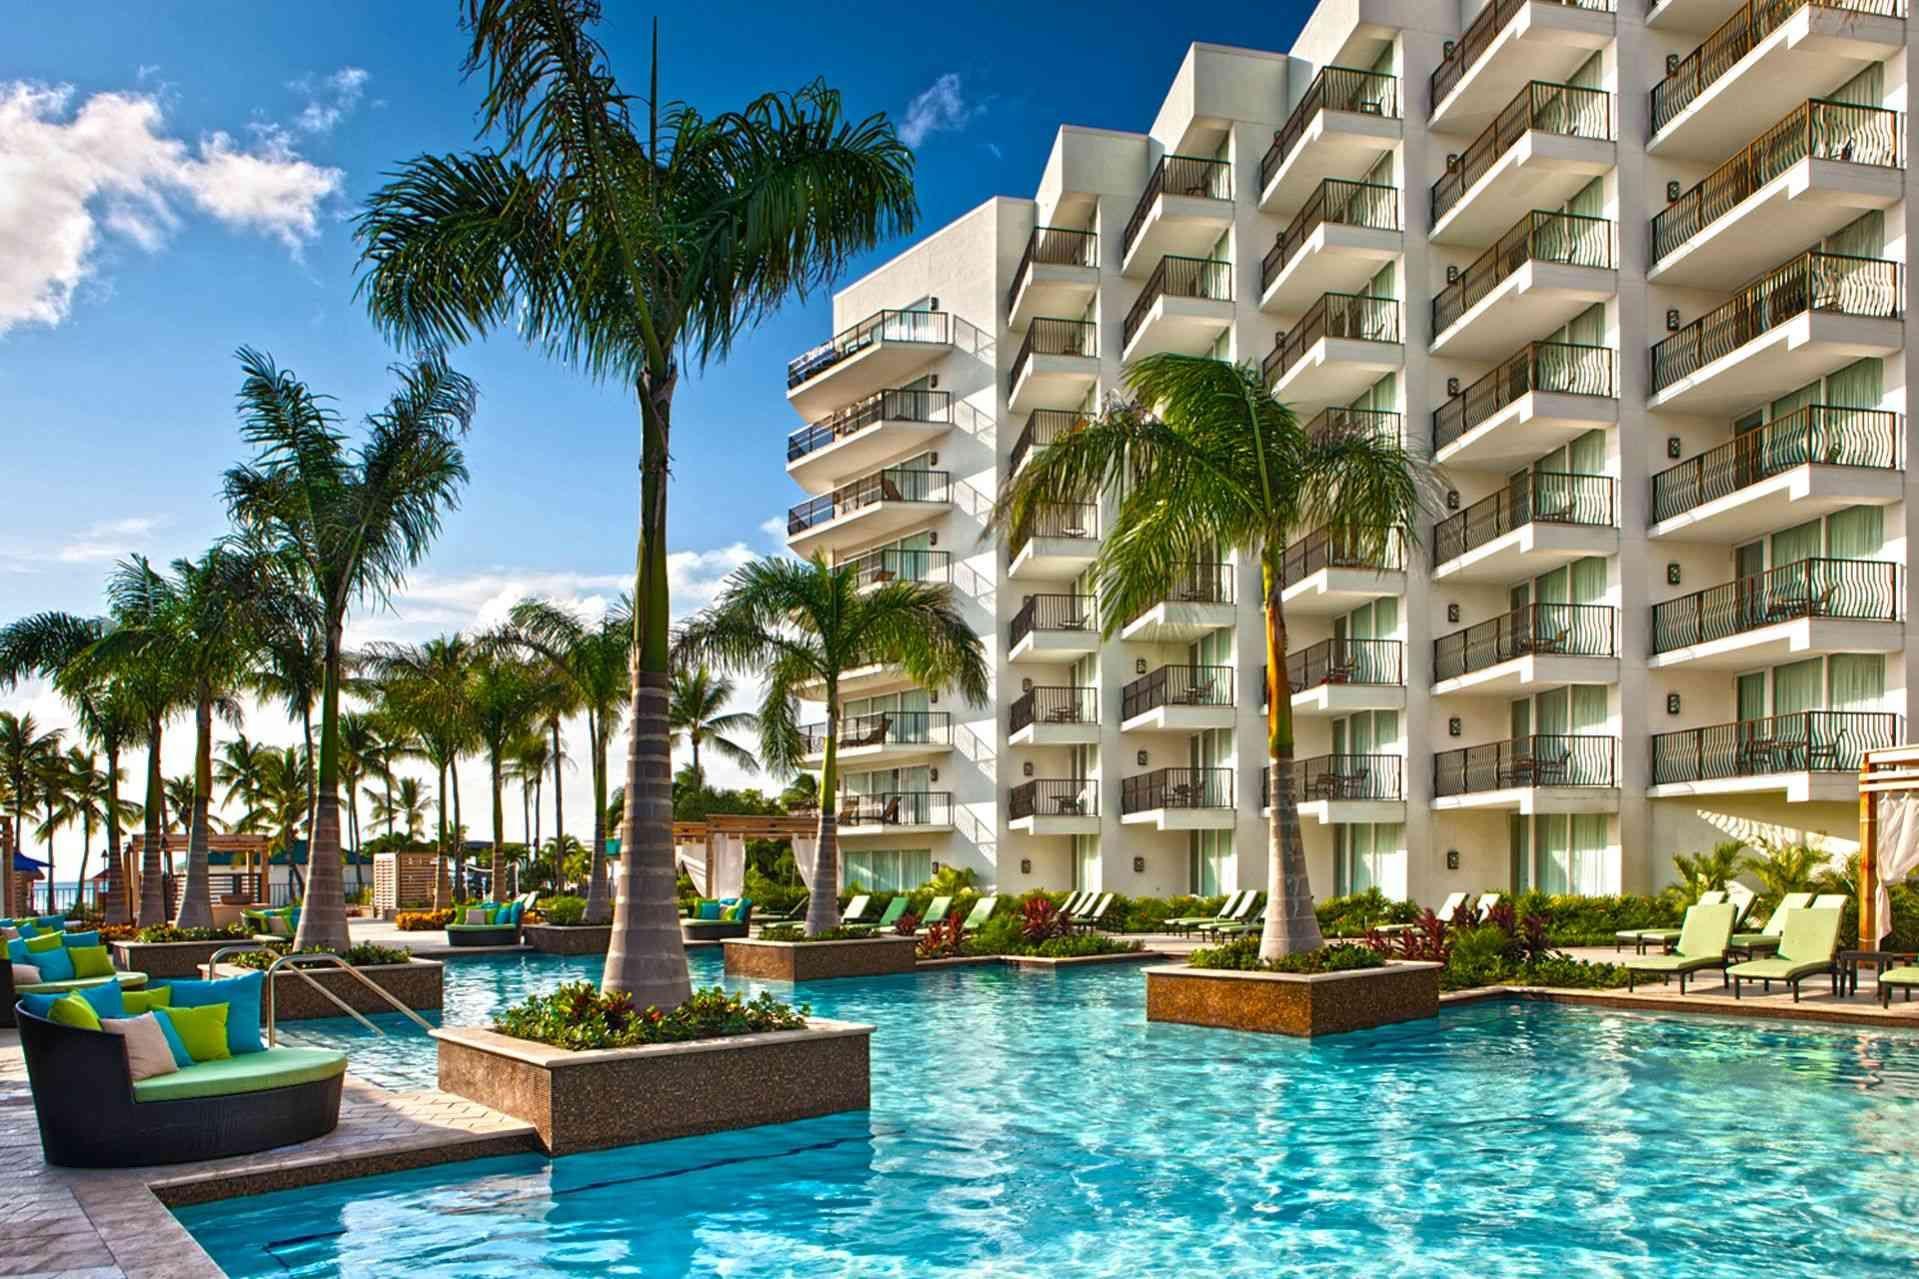 Photo Courtesy Of Aruba Marriott Resort Away We Go Pinterest - All inclusive family resorts caribbean